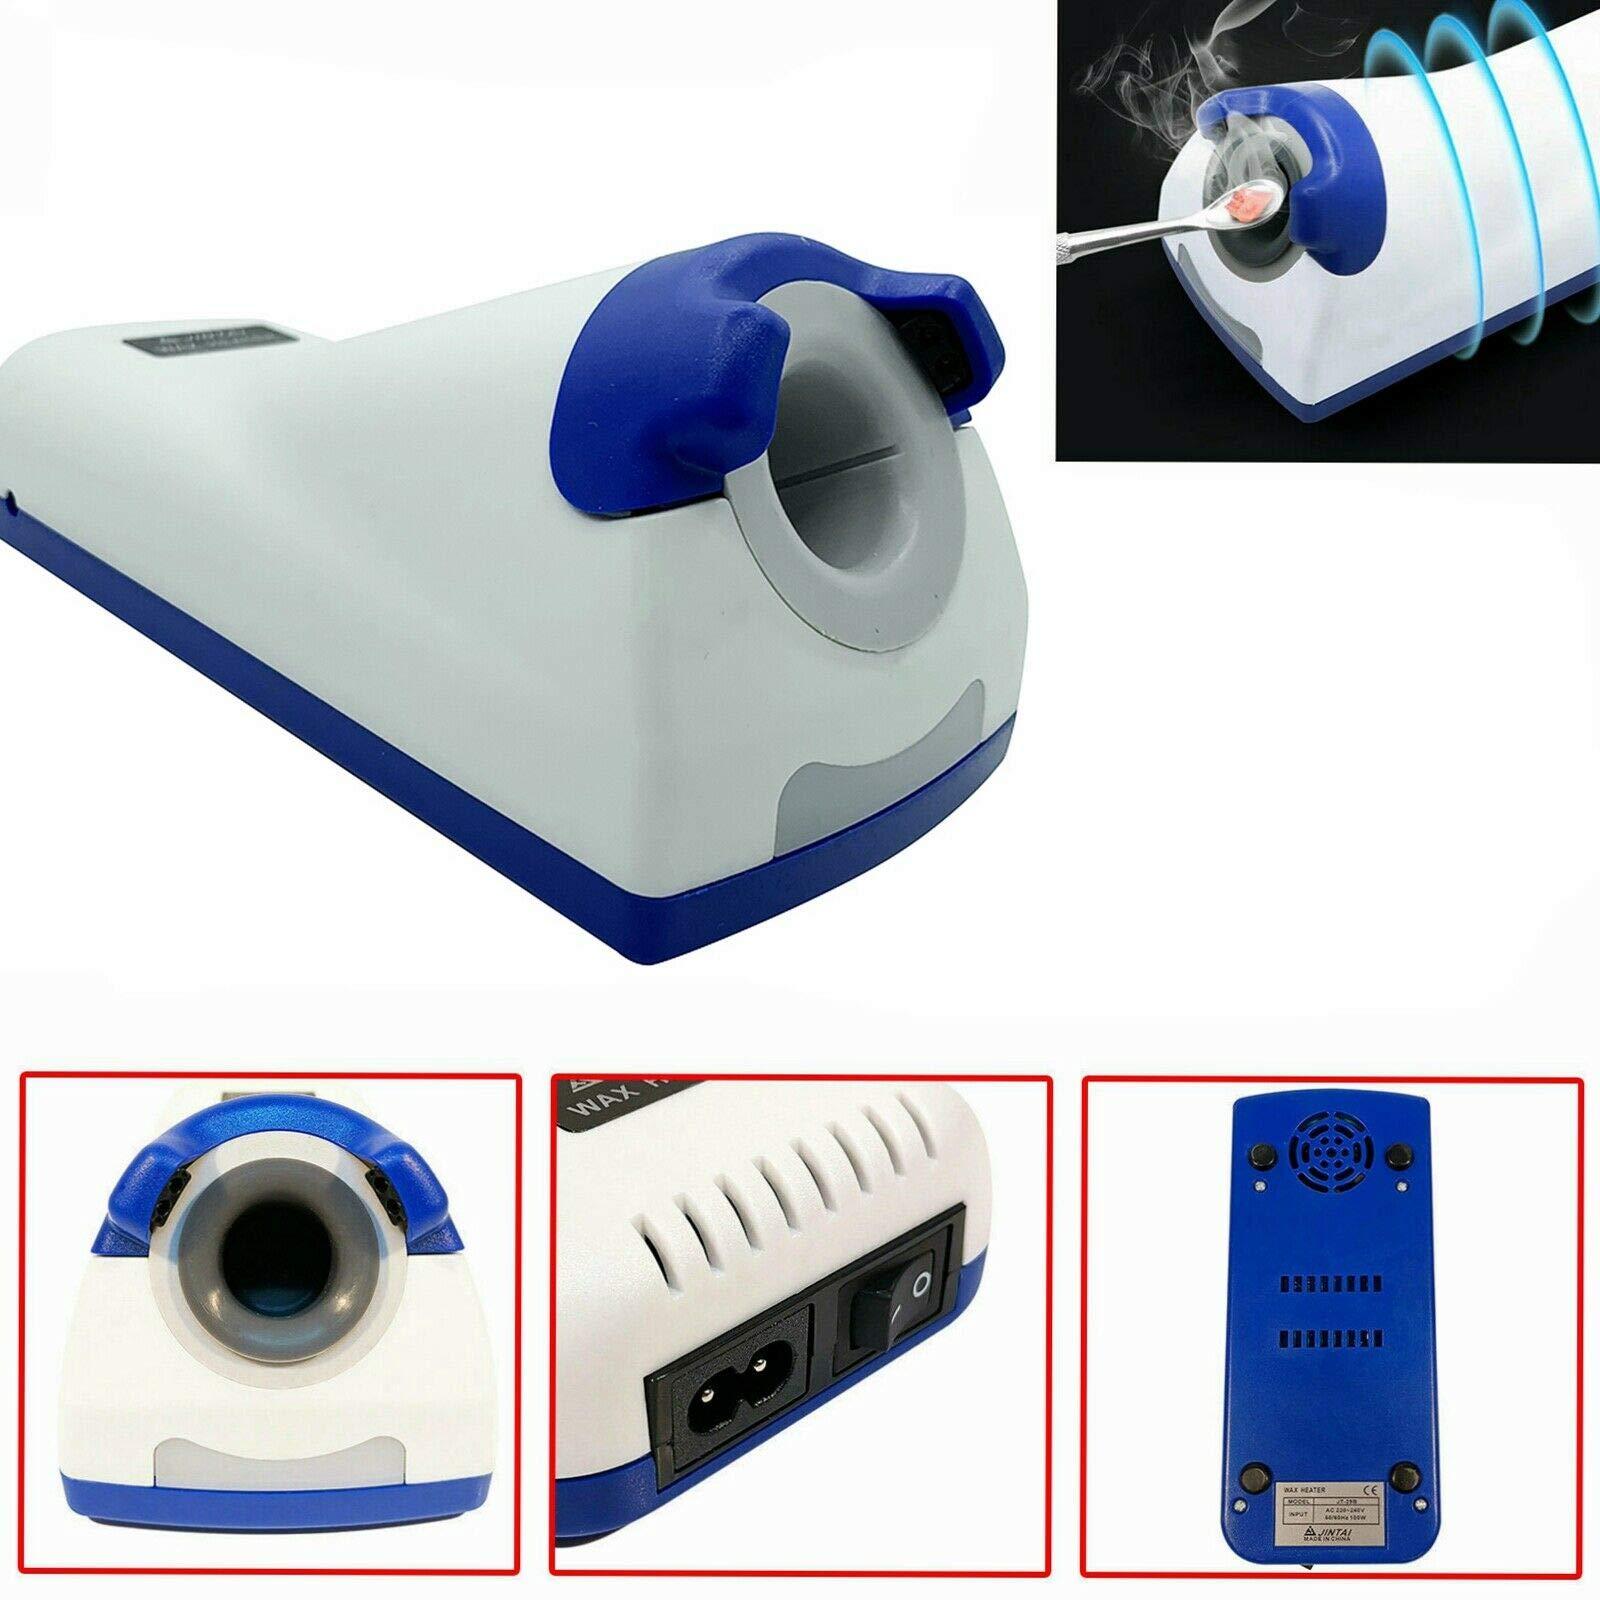 Ocean Aquarius Electronic Wax Carving Heater Infared Spatulas Sensor No Flame Pot with and Safe & Efficient by Ocean Aquarius